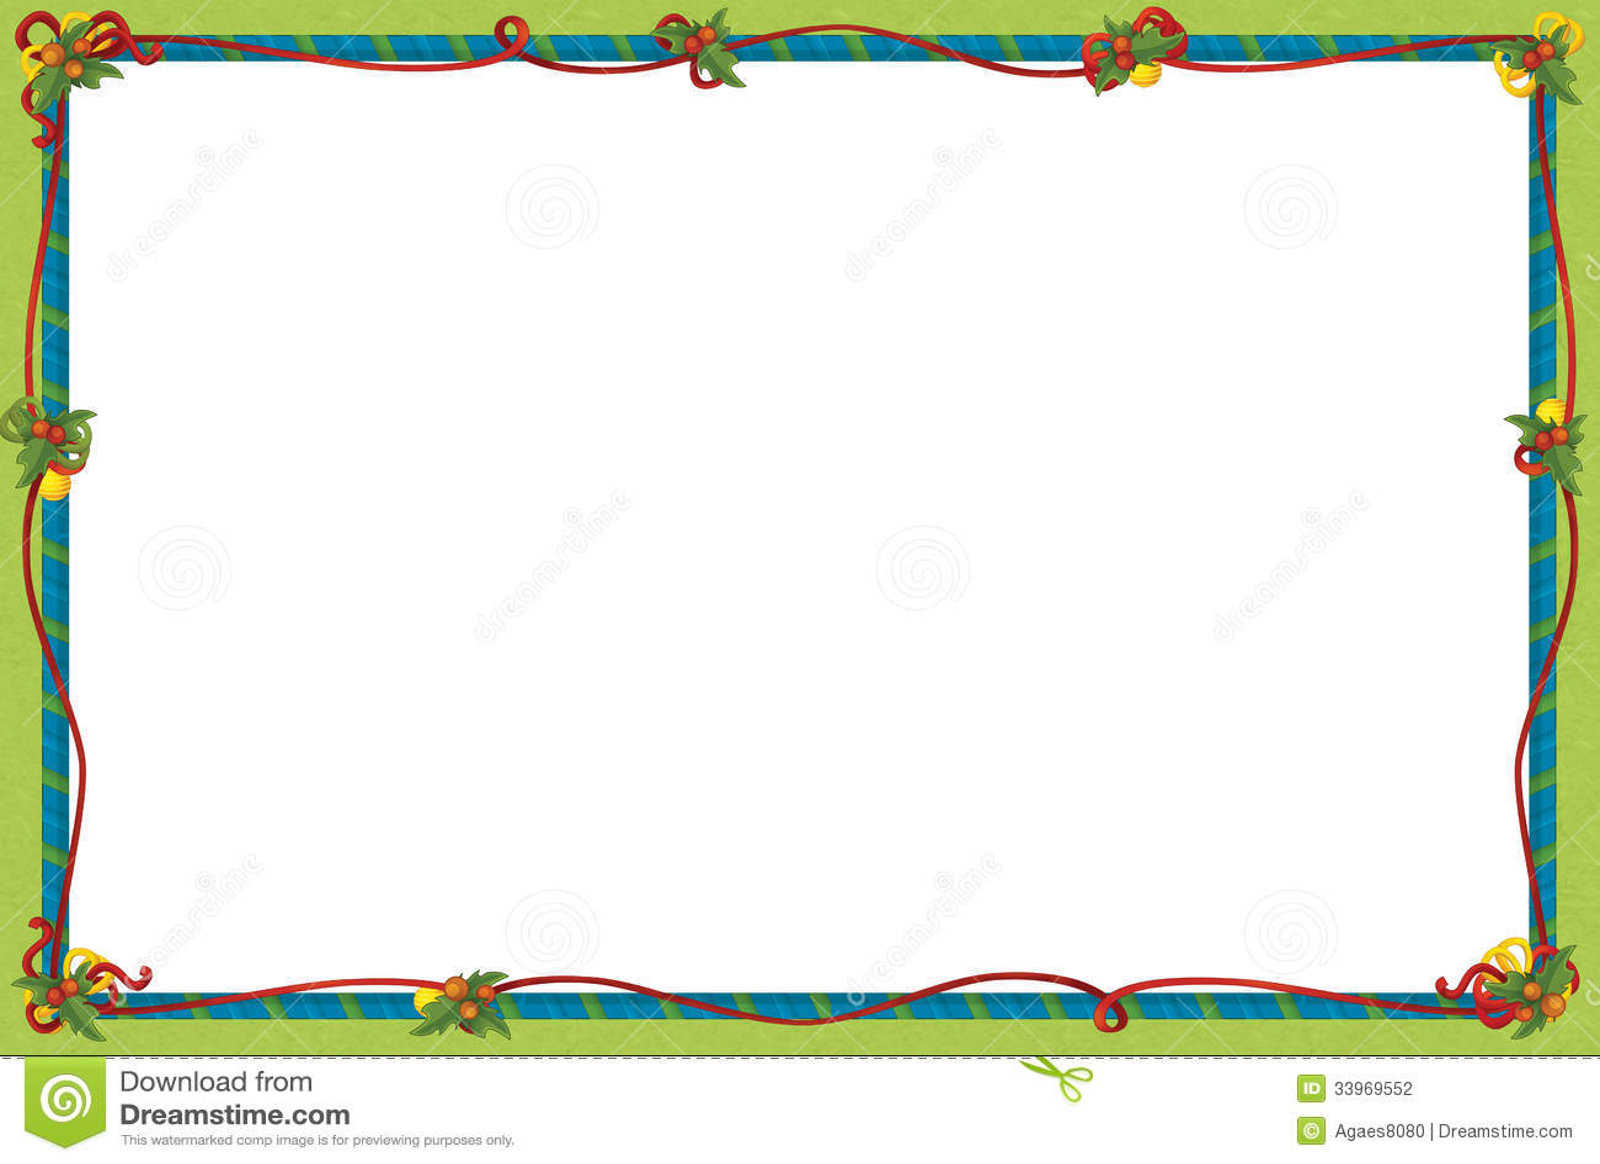 The Christmas Frame Border Cartoon Illustration Stock